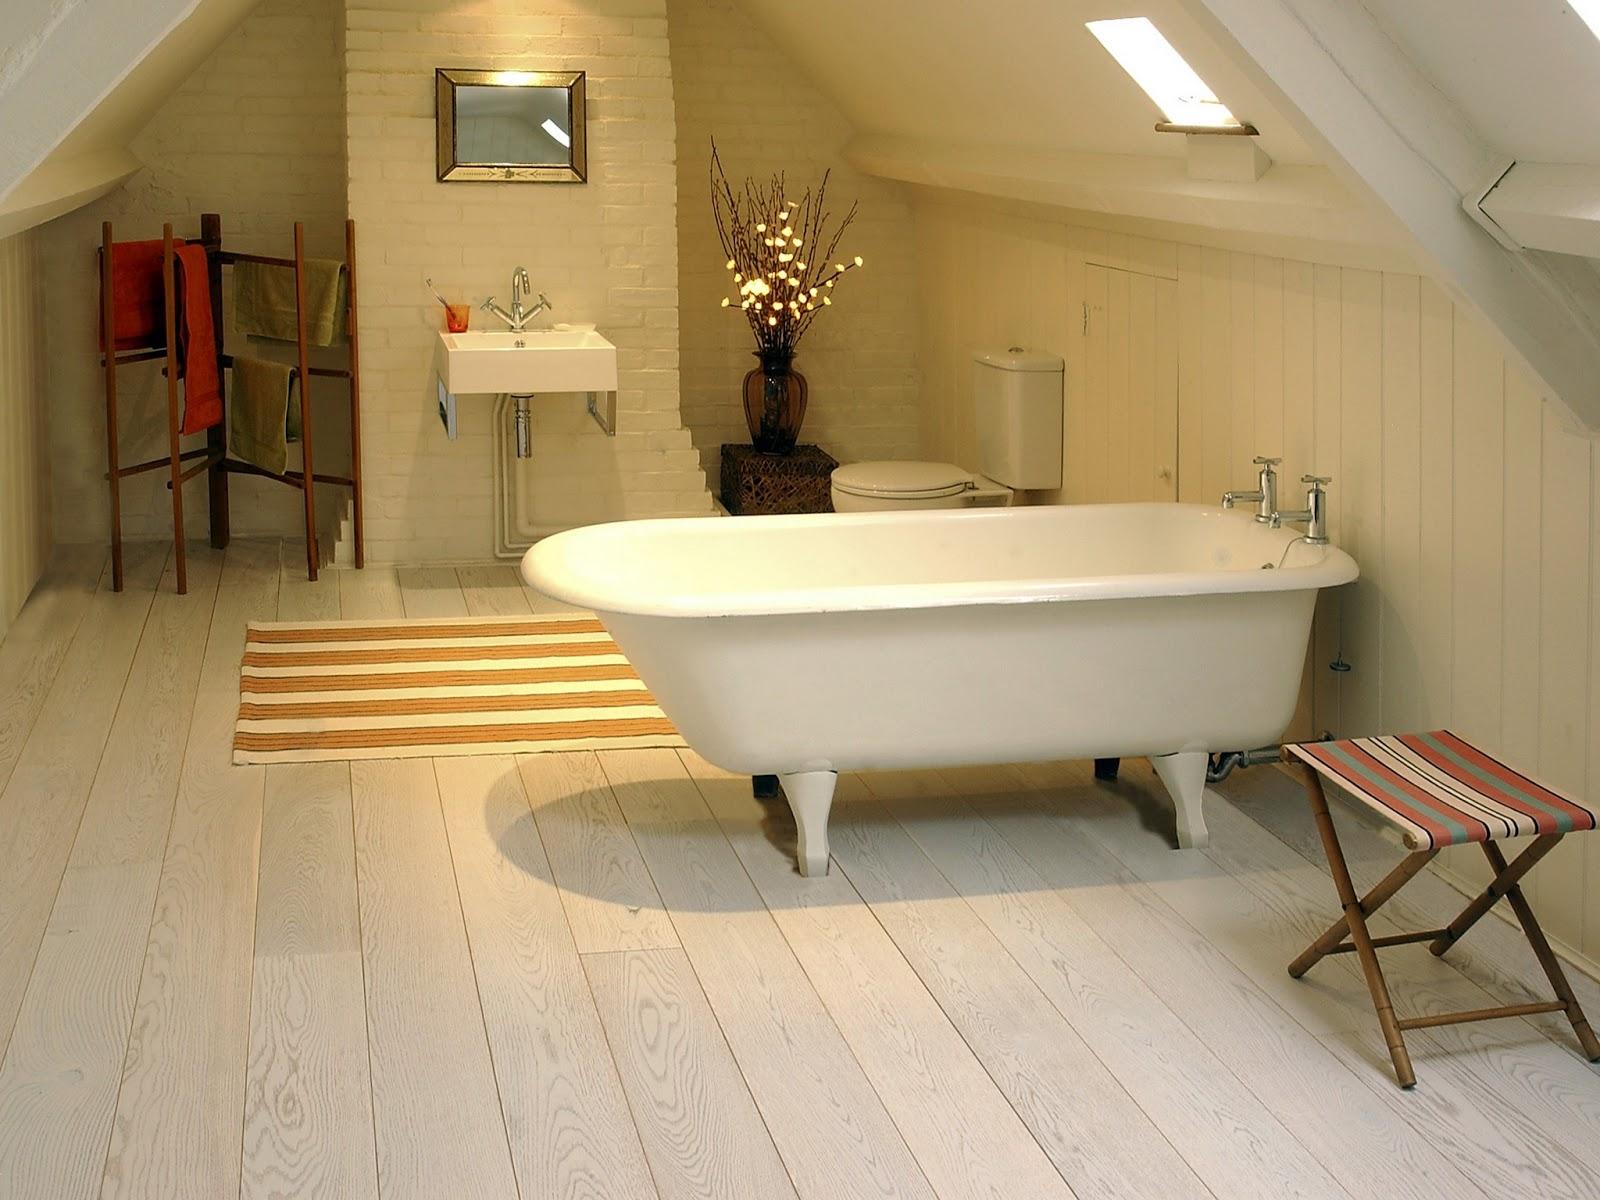 Bathroom Floor Tile Options - FELISH HOME PROJECT